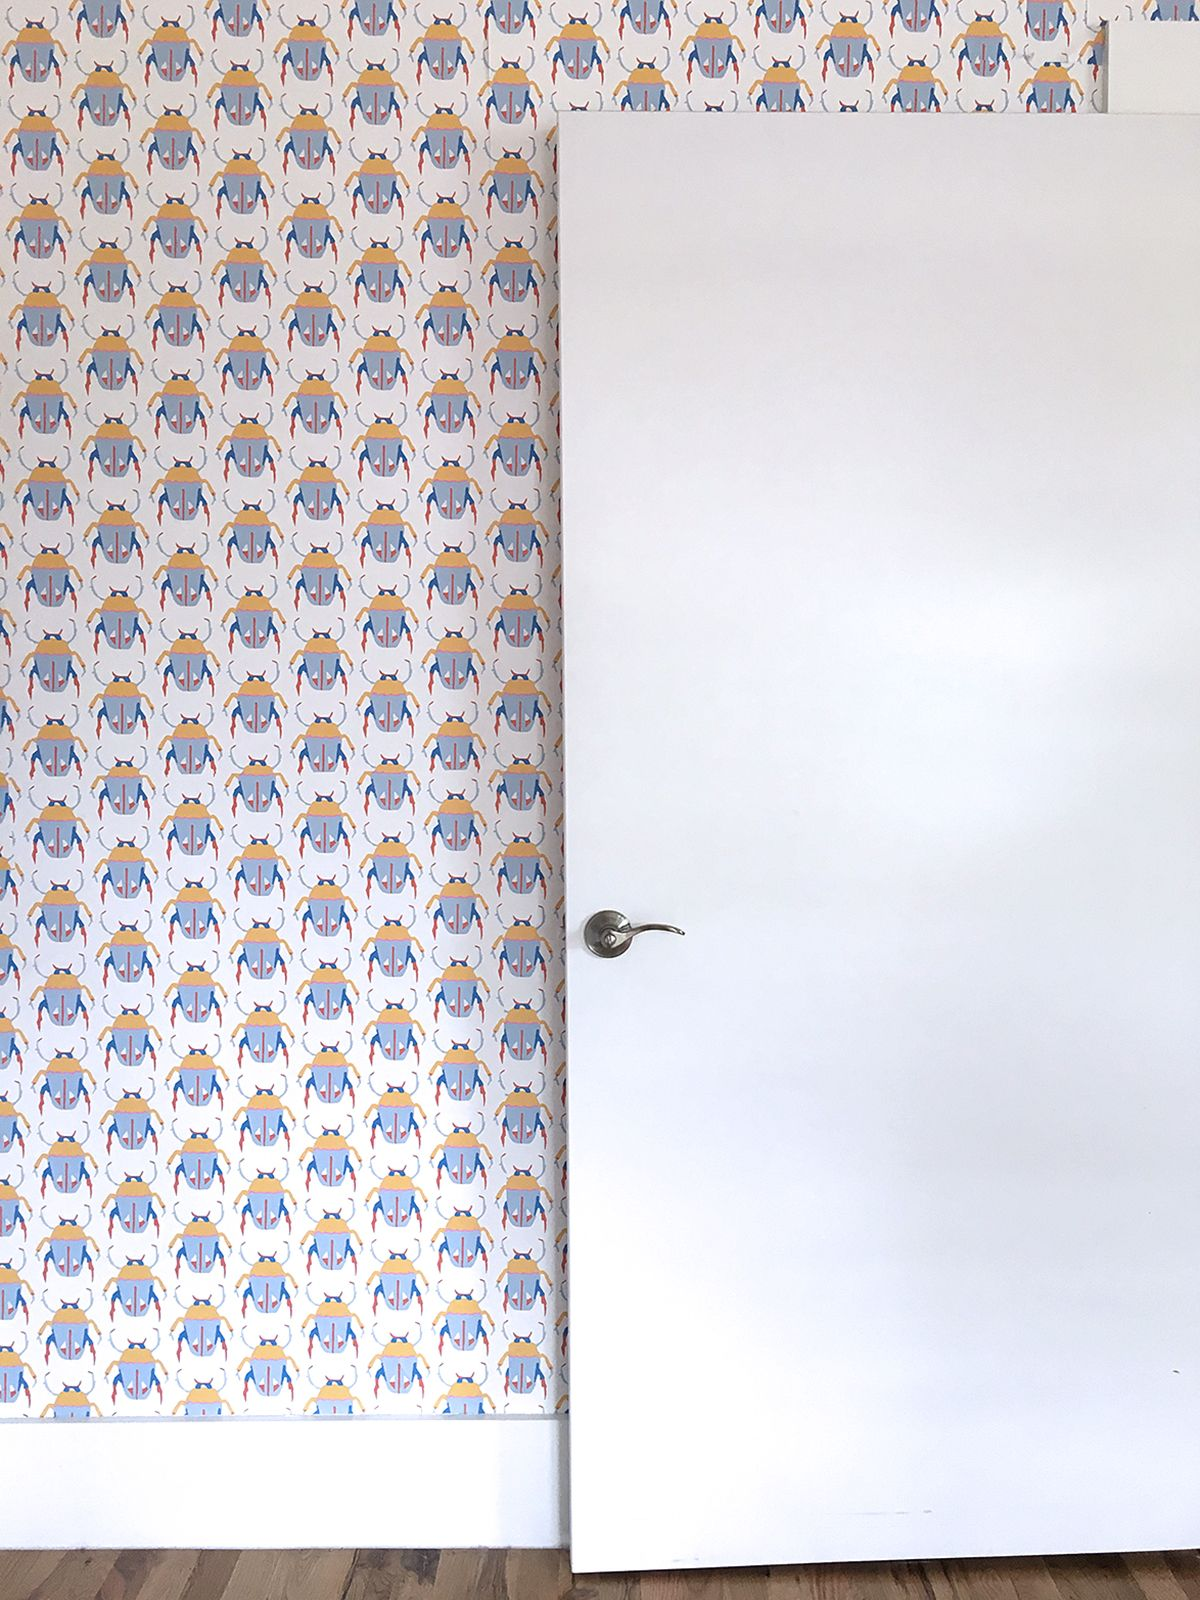 Beetle Print. KatieKimeWallpaper Katie kime wallpaper